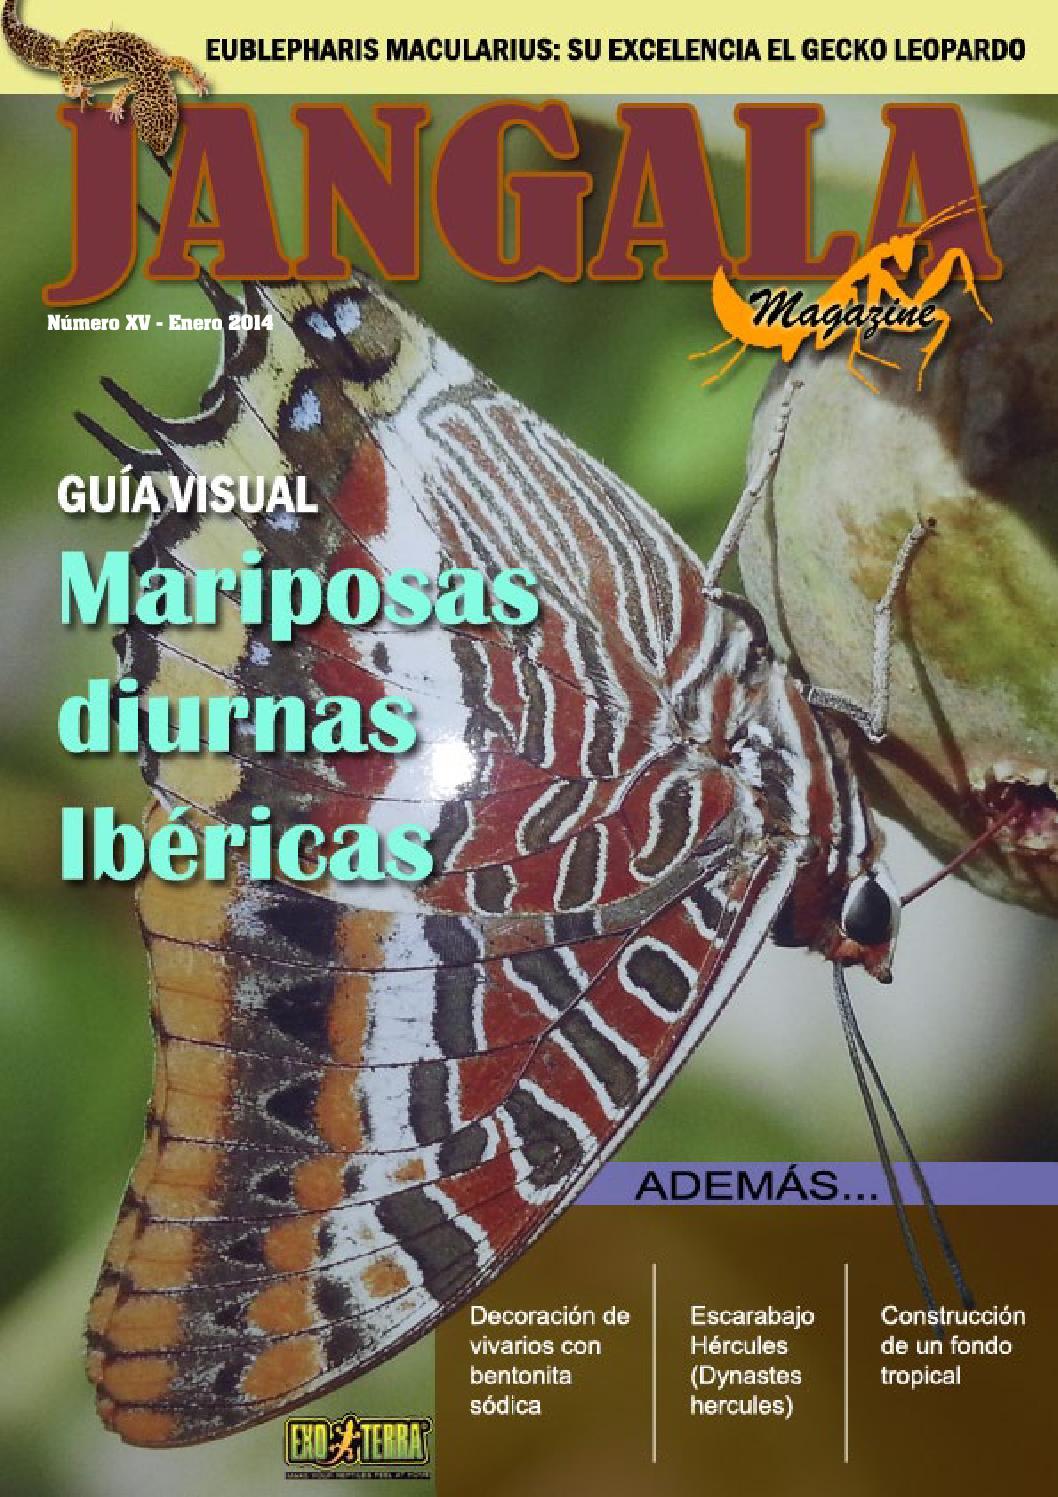 Jangala Magazine - Número XV Enero 2014 by Jangala Magazine - issuu